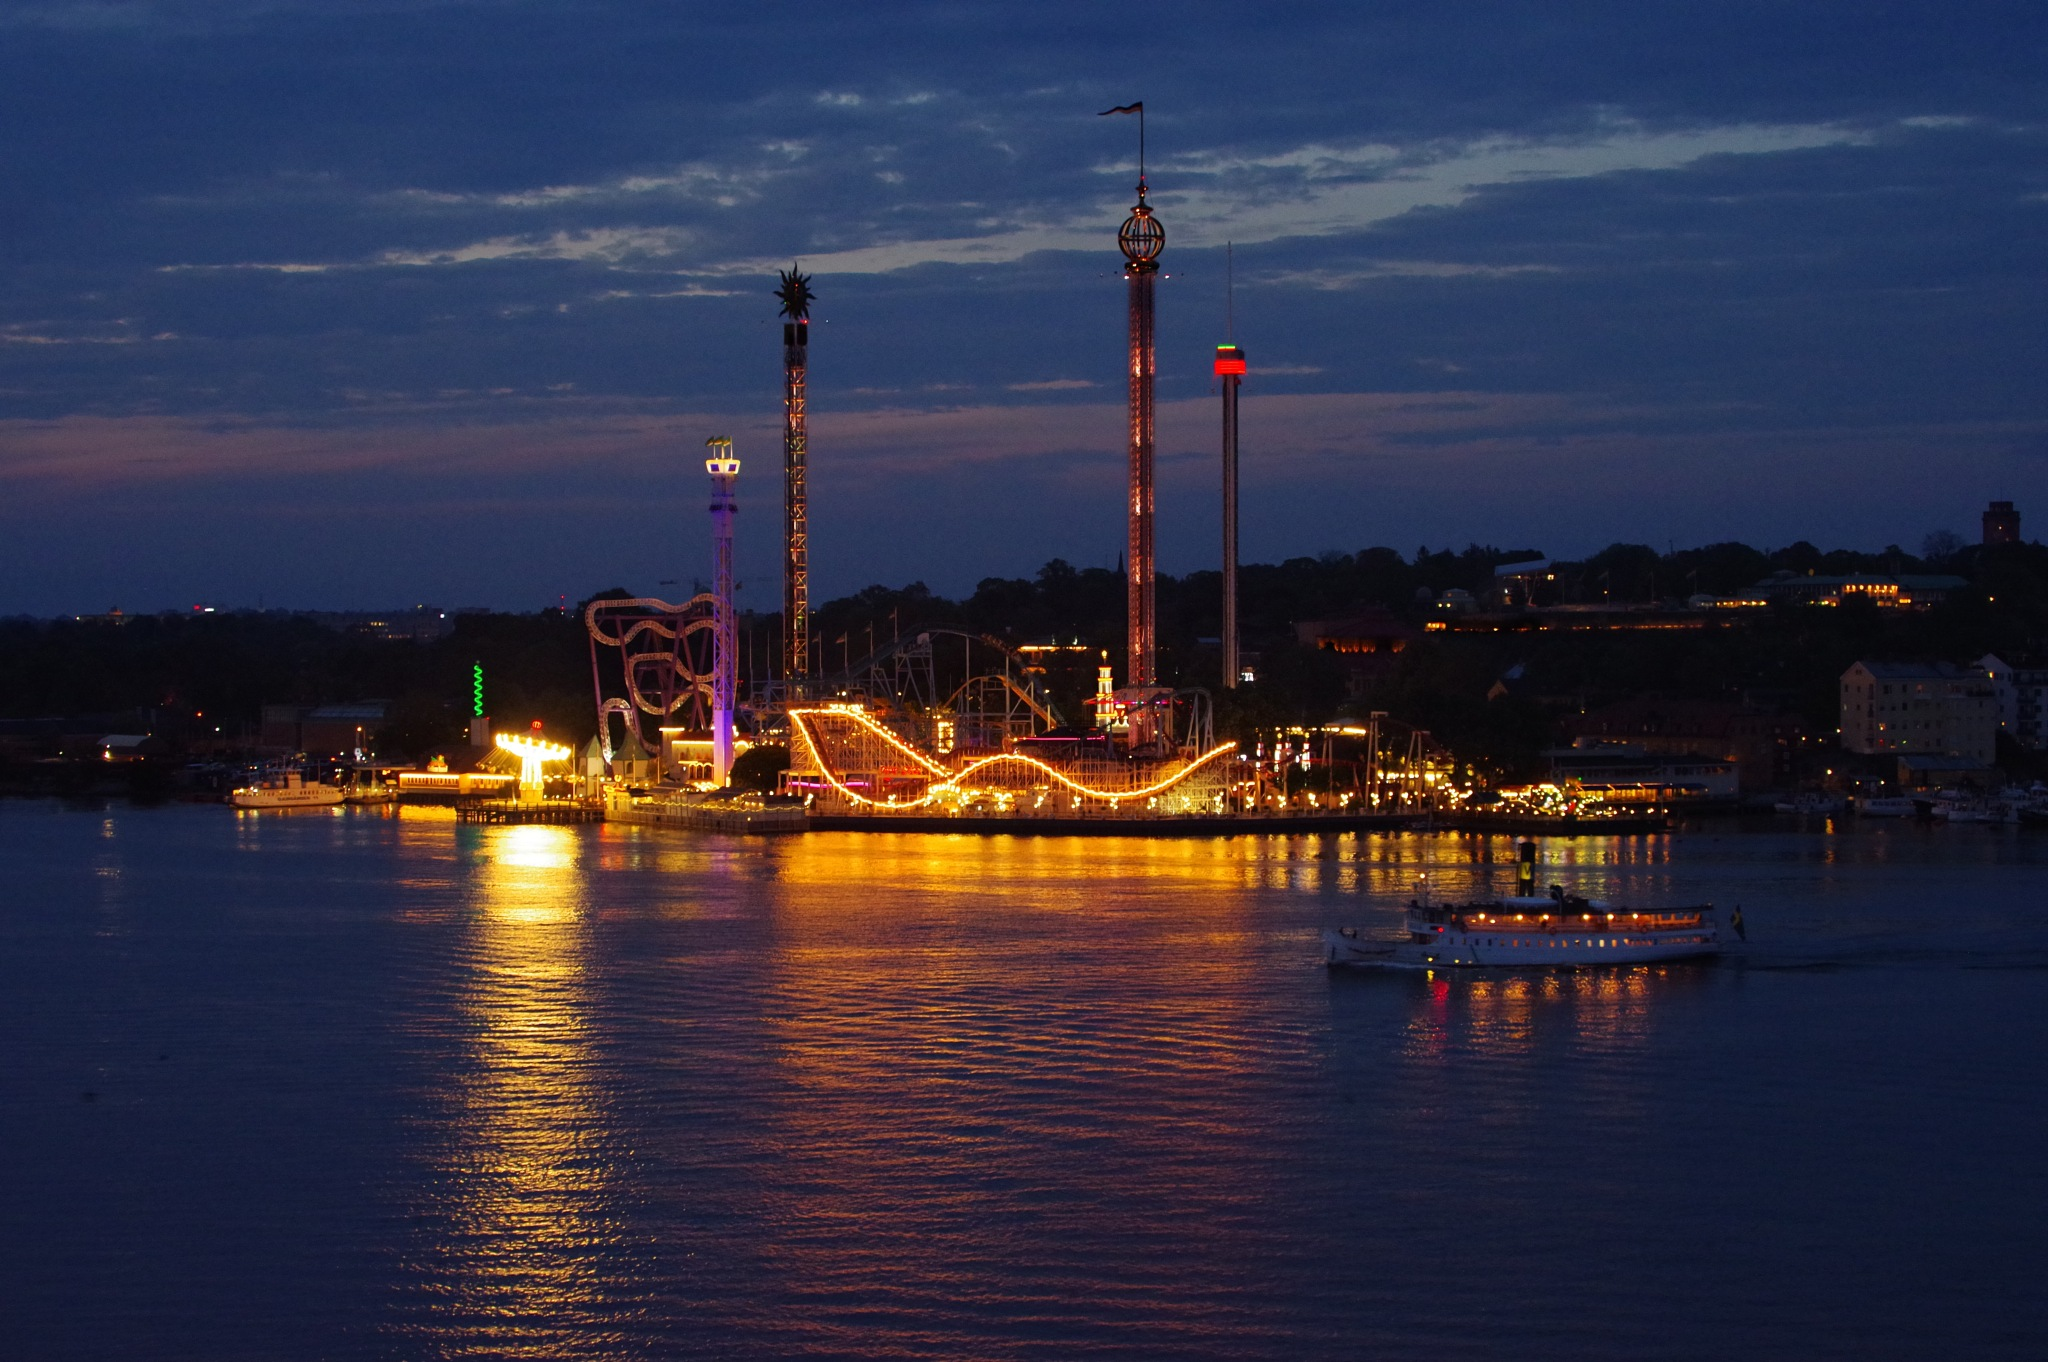 Stockholm by Night, Tivoli by Annica Nykvist